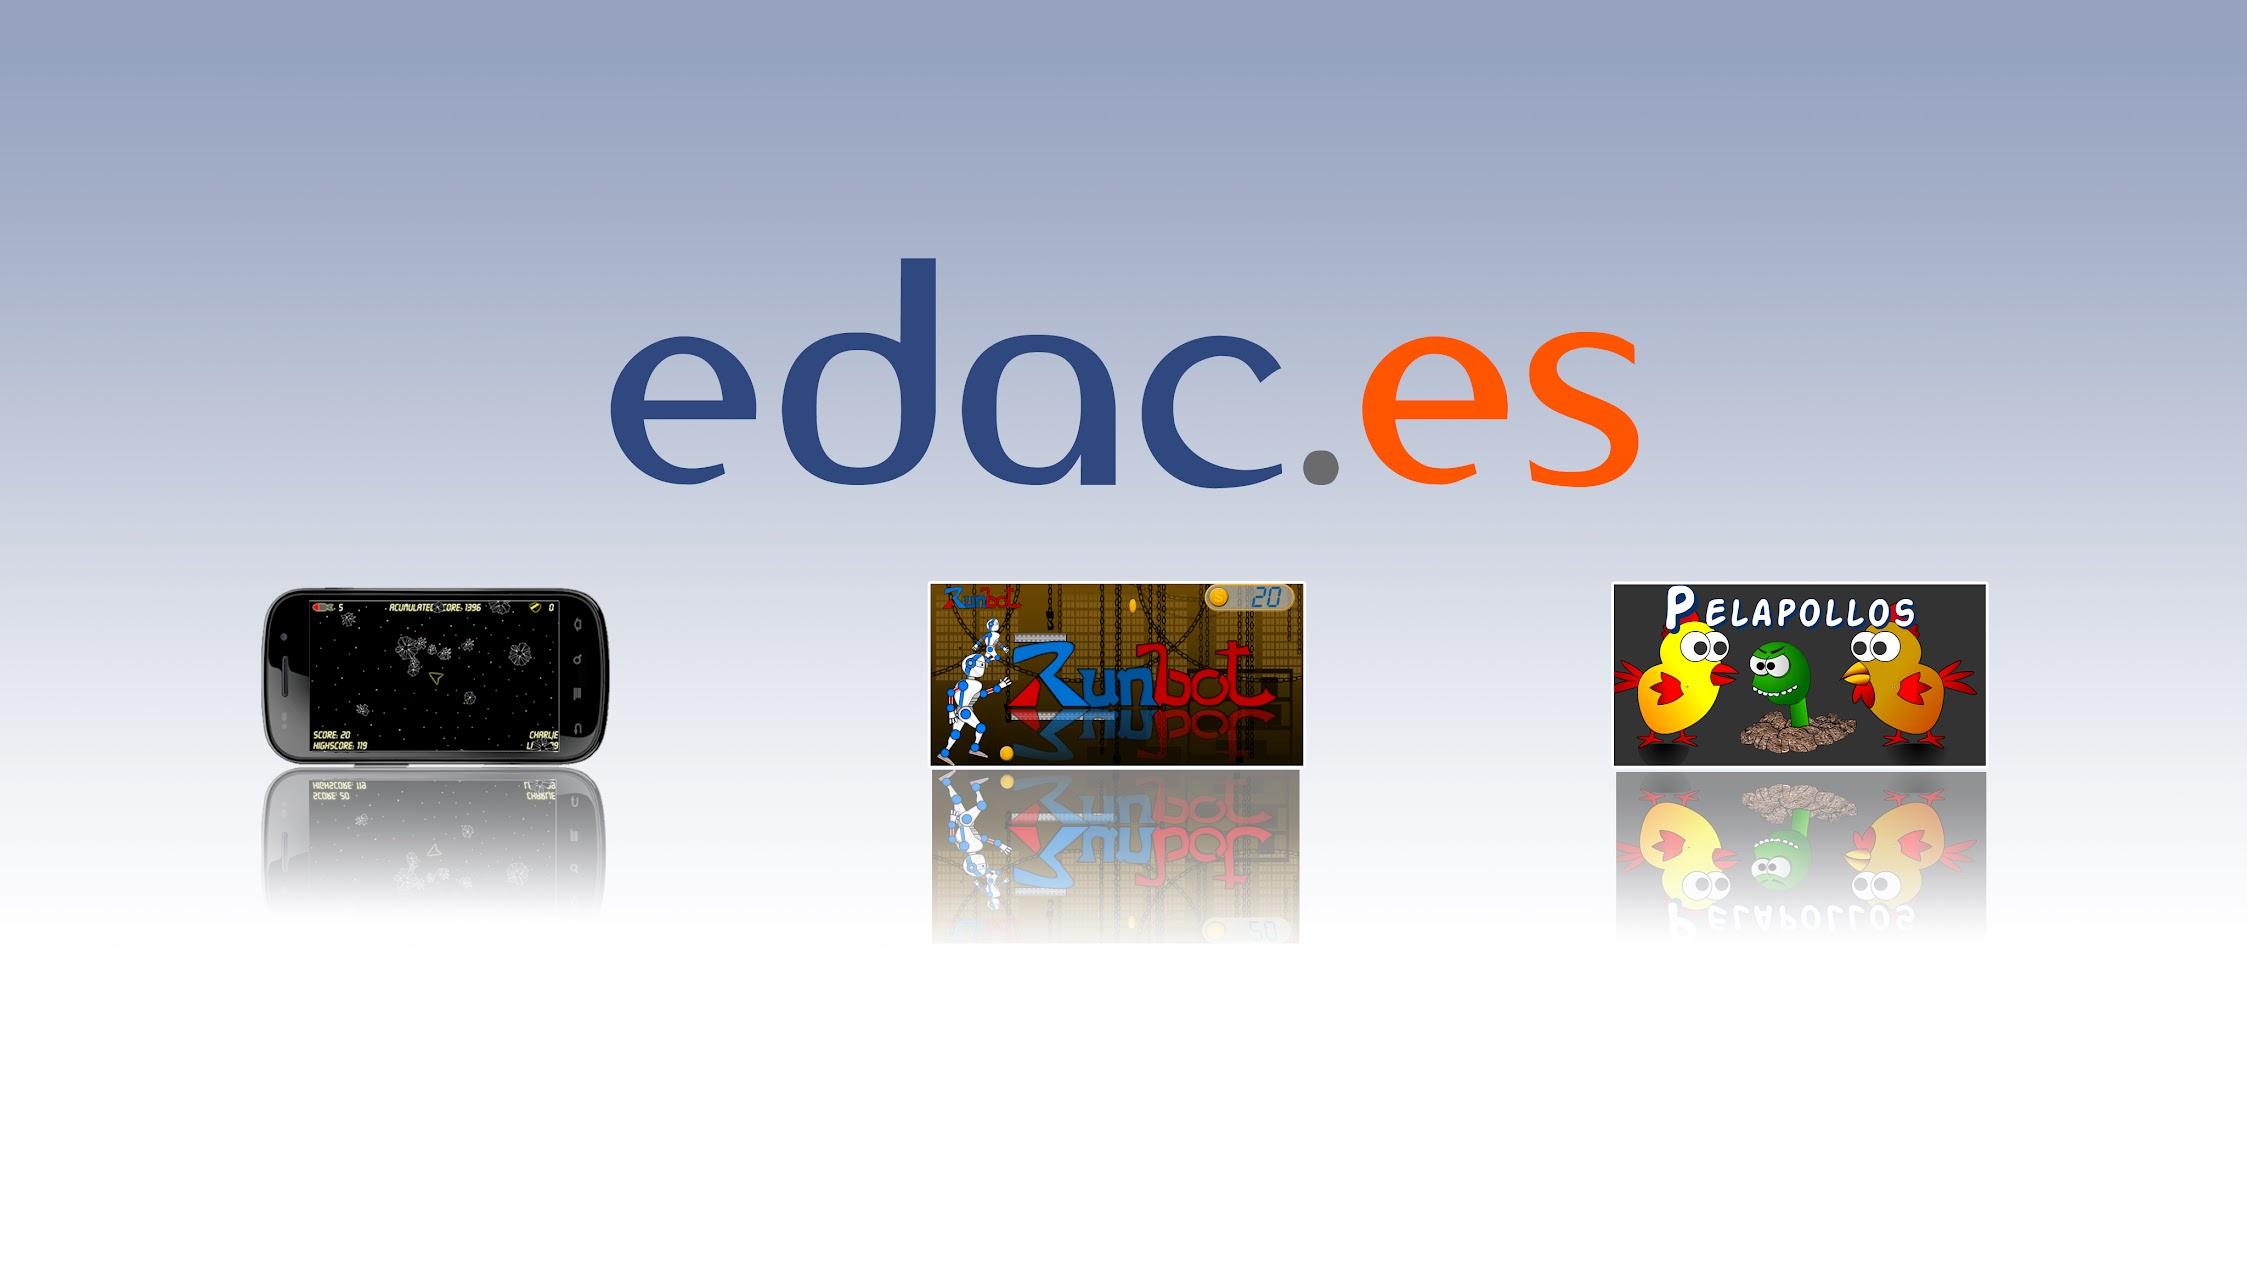 EDAC.ES